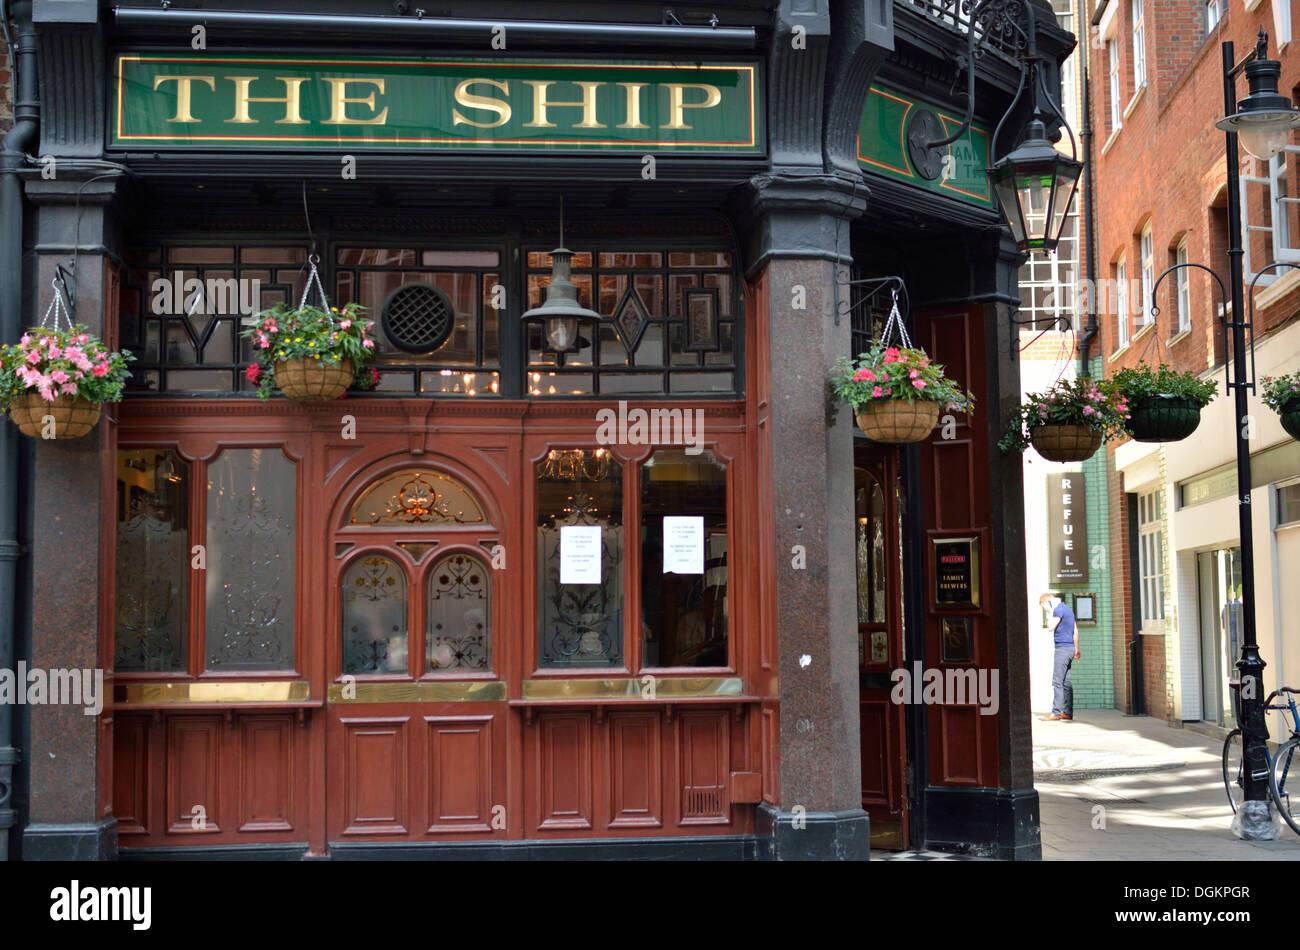 The Ship pub on Wardour Street. - Stock Image